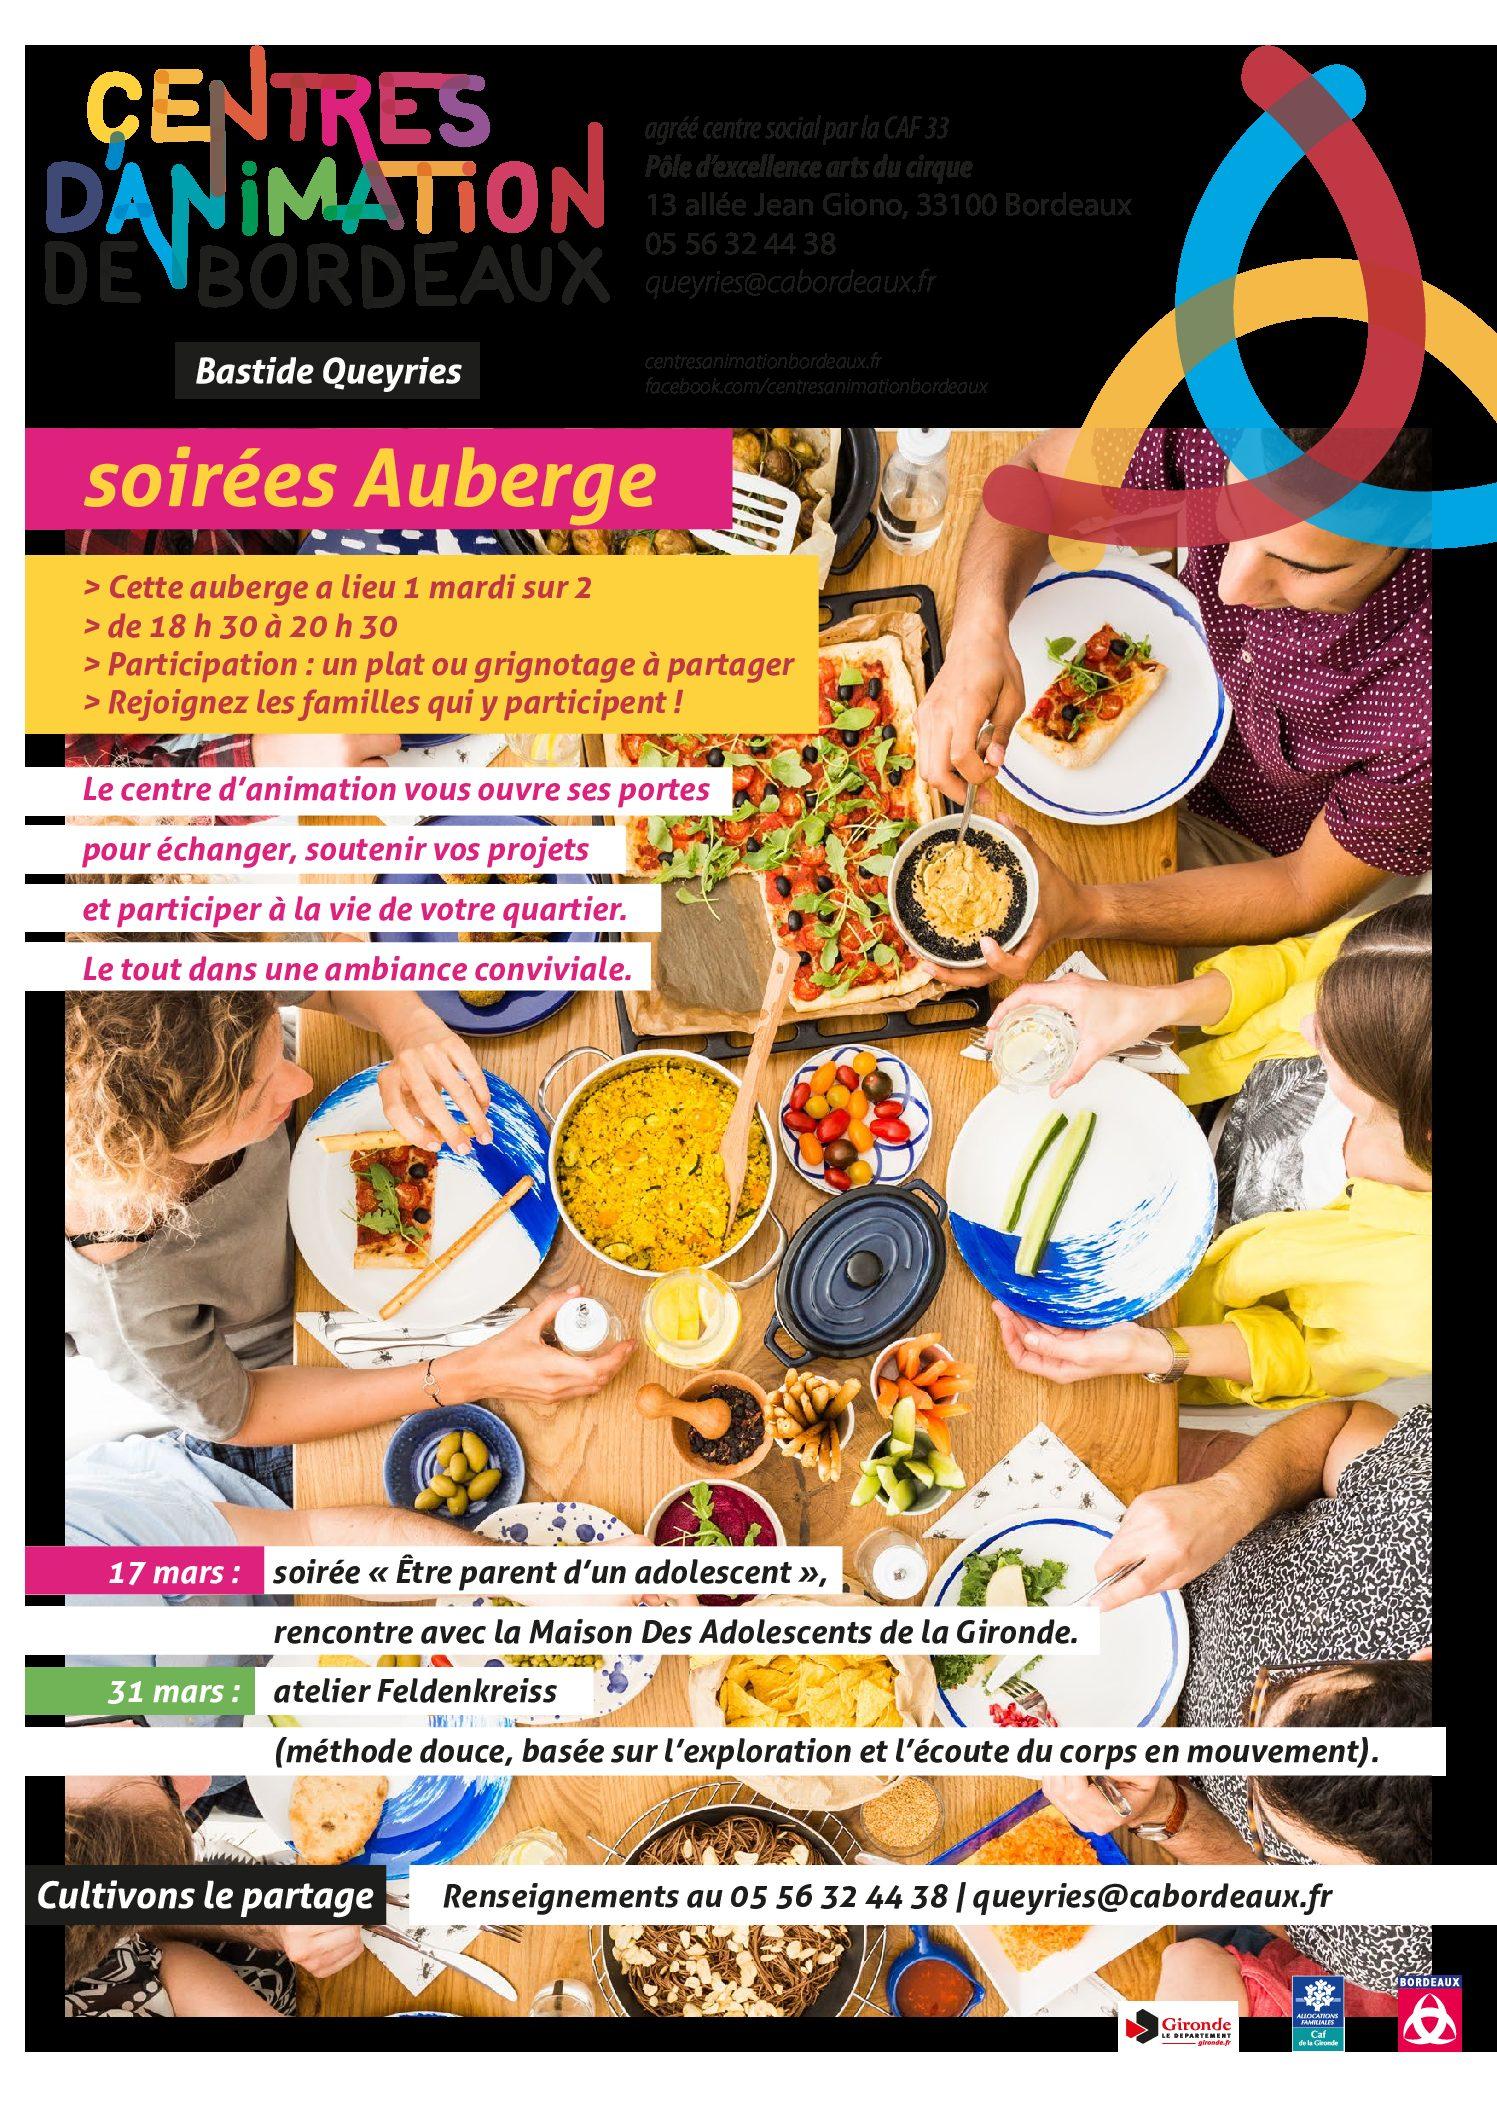 Adultes & Familles - Soirée Auberge - Mars